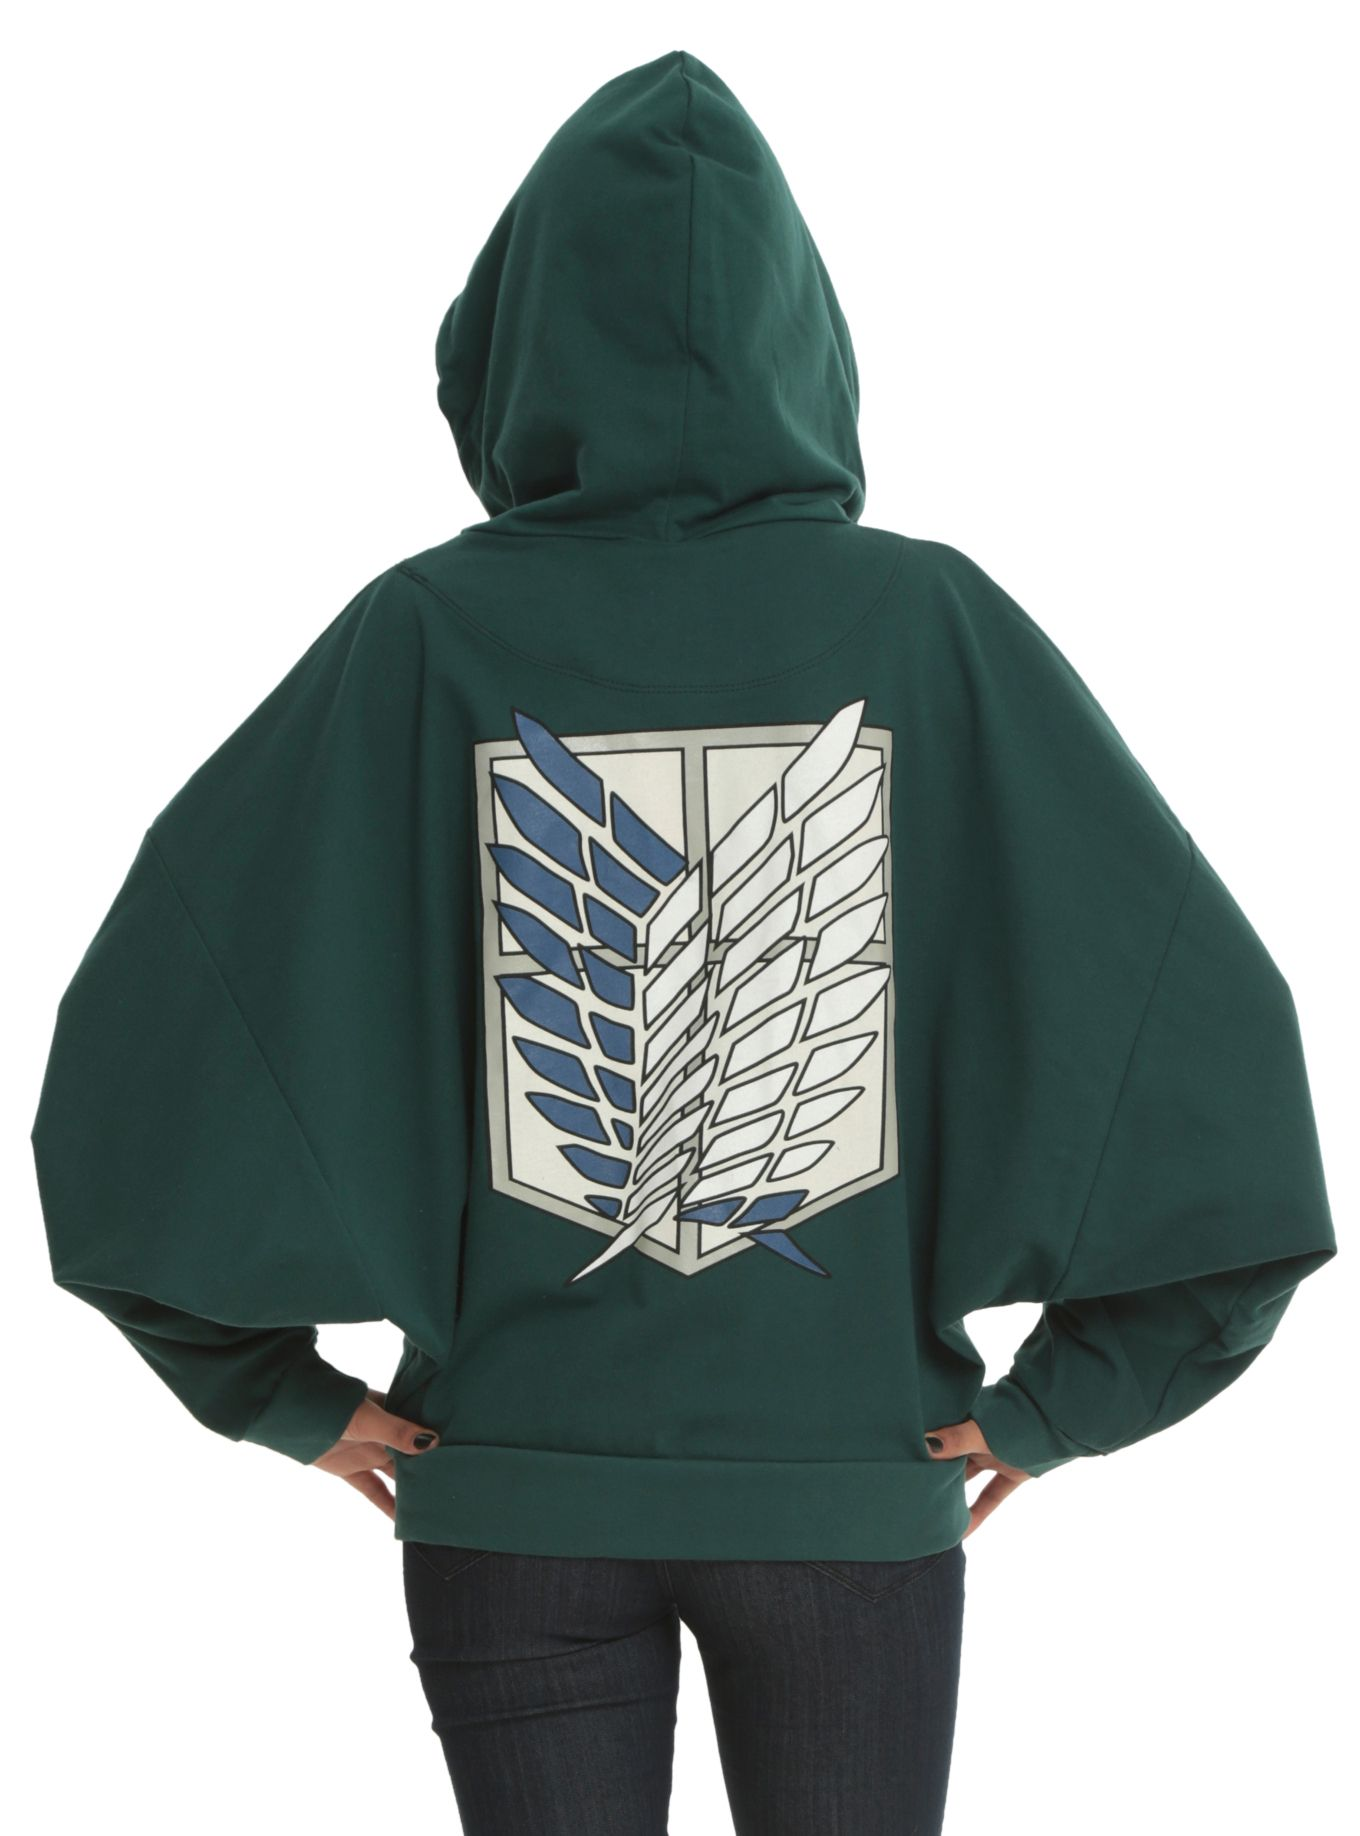 Attack on titan scout regiment girls costume hoodie